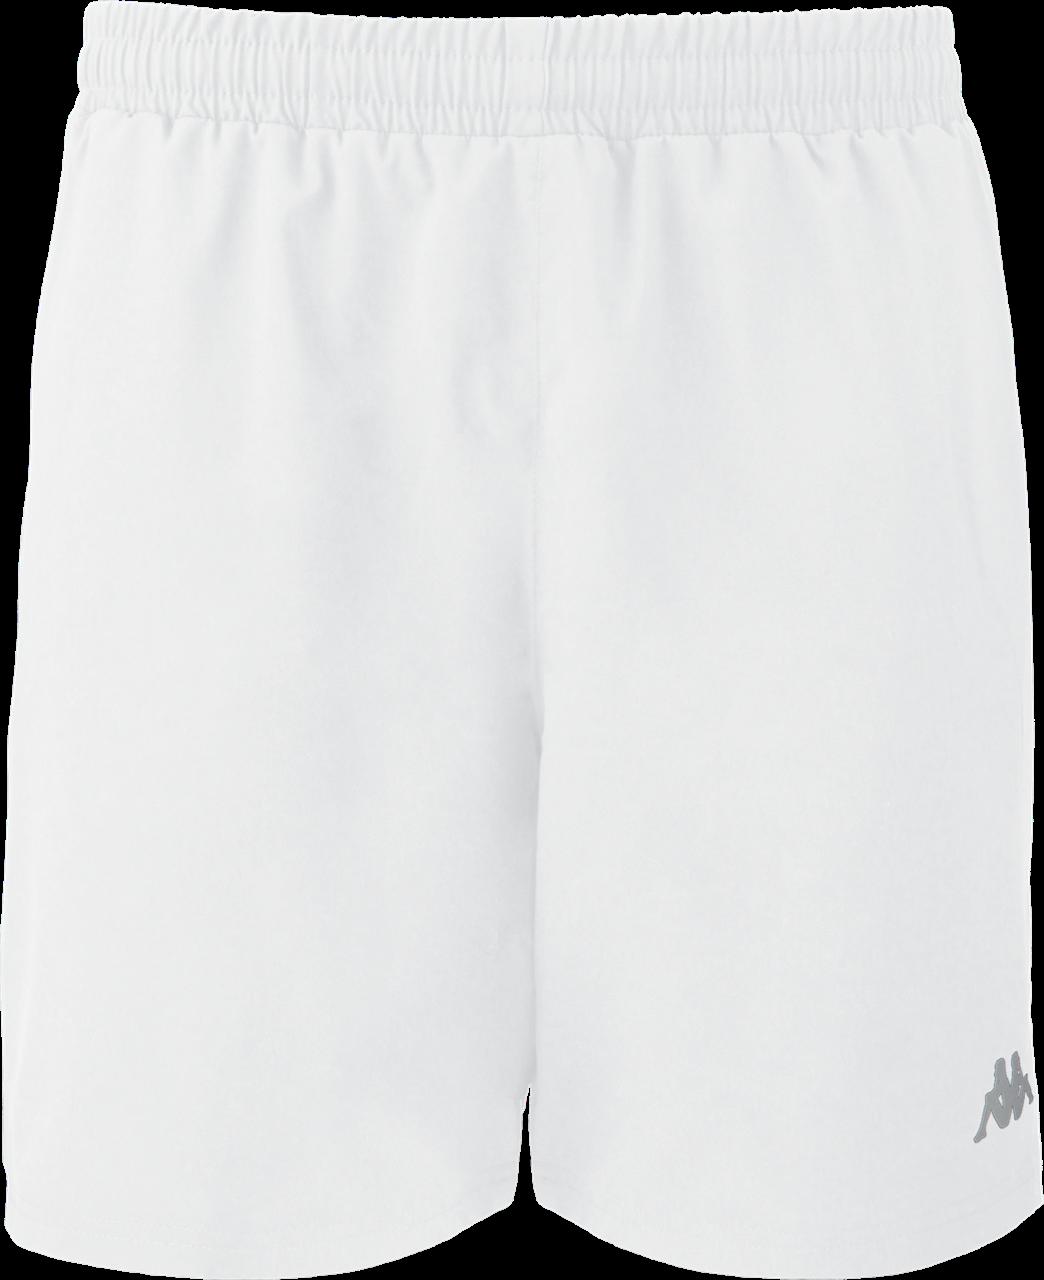 Kappa Lambre Tennis Shorts 304MBA0J - JUNIOR